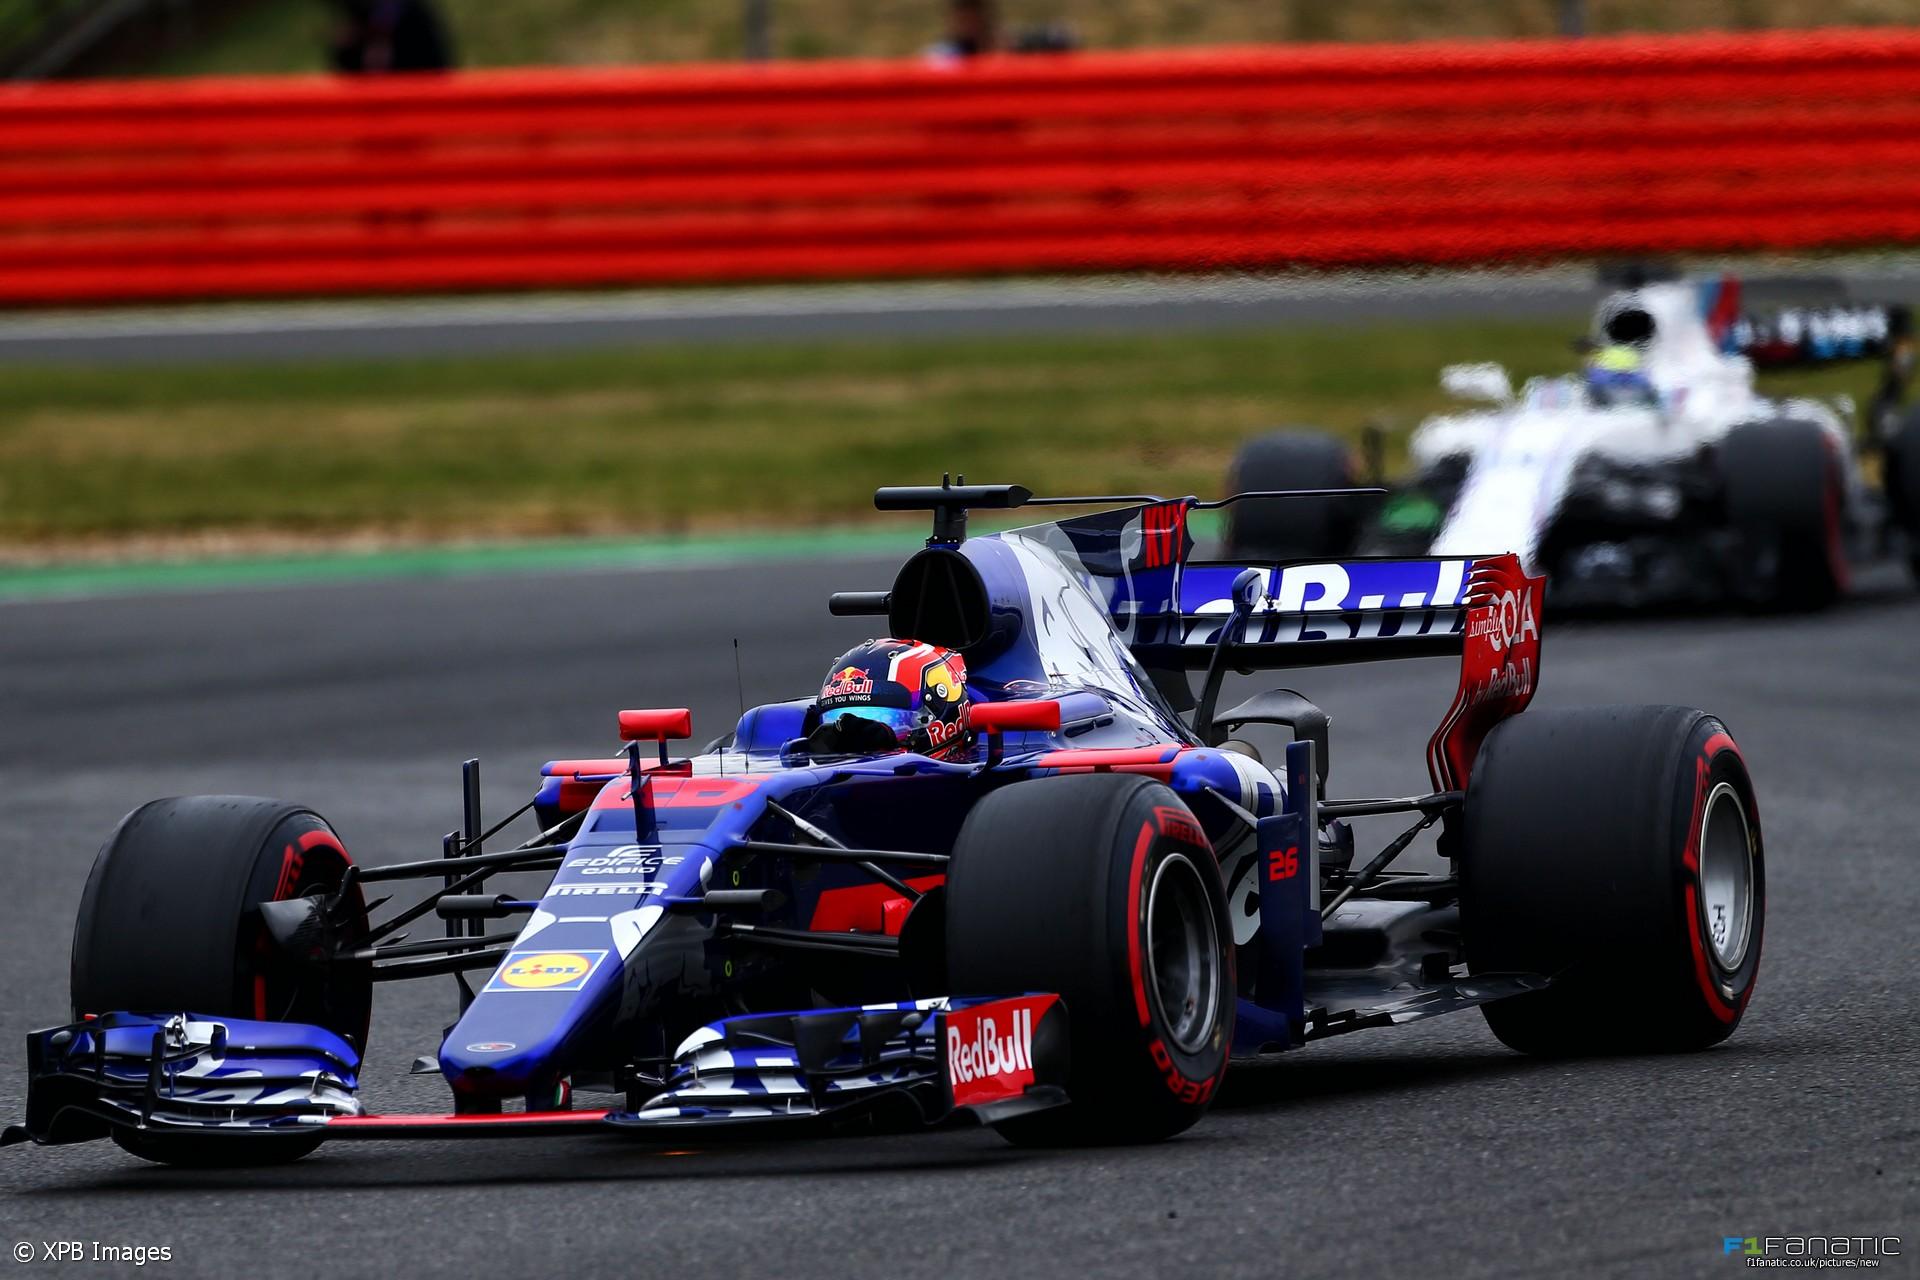 Daniil Kvyat, Toro Rosso, Silverstone, 2017